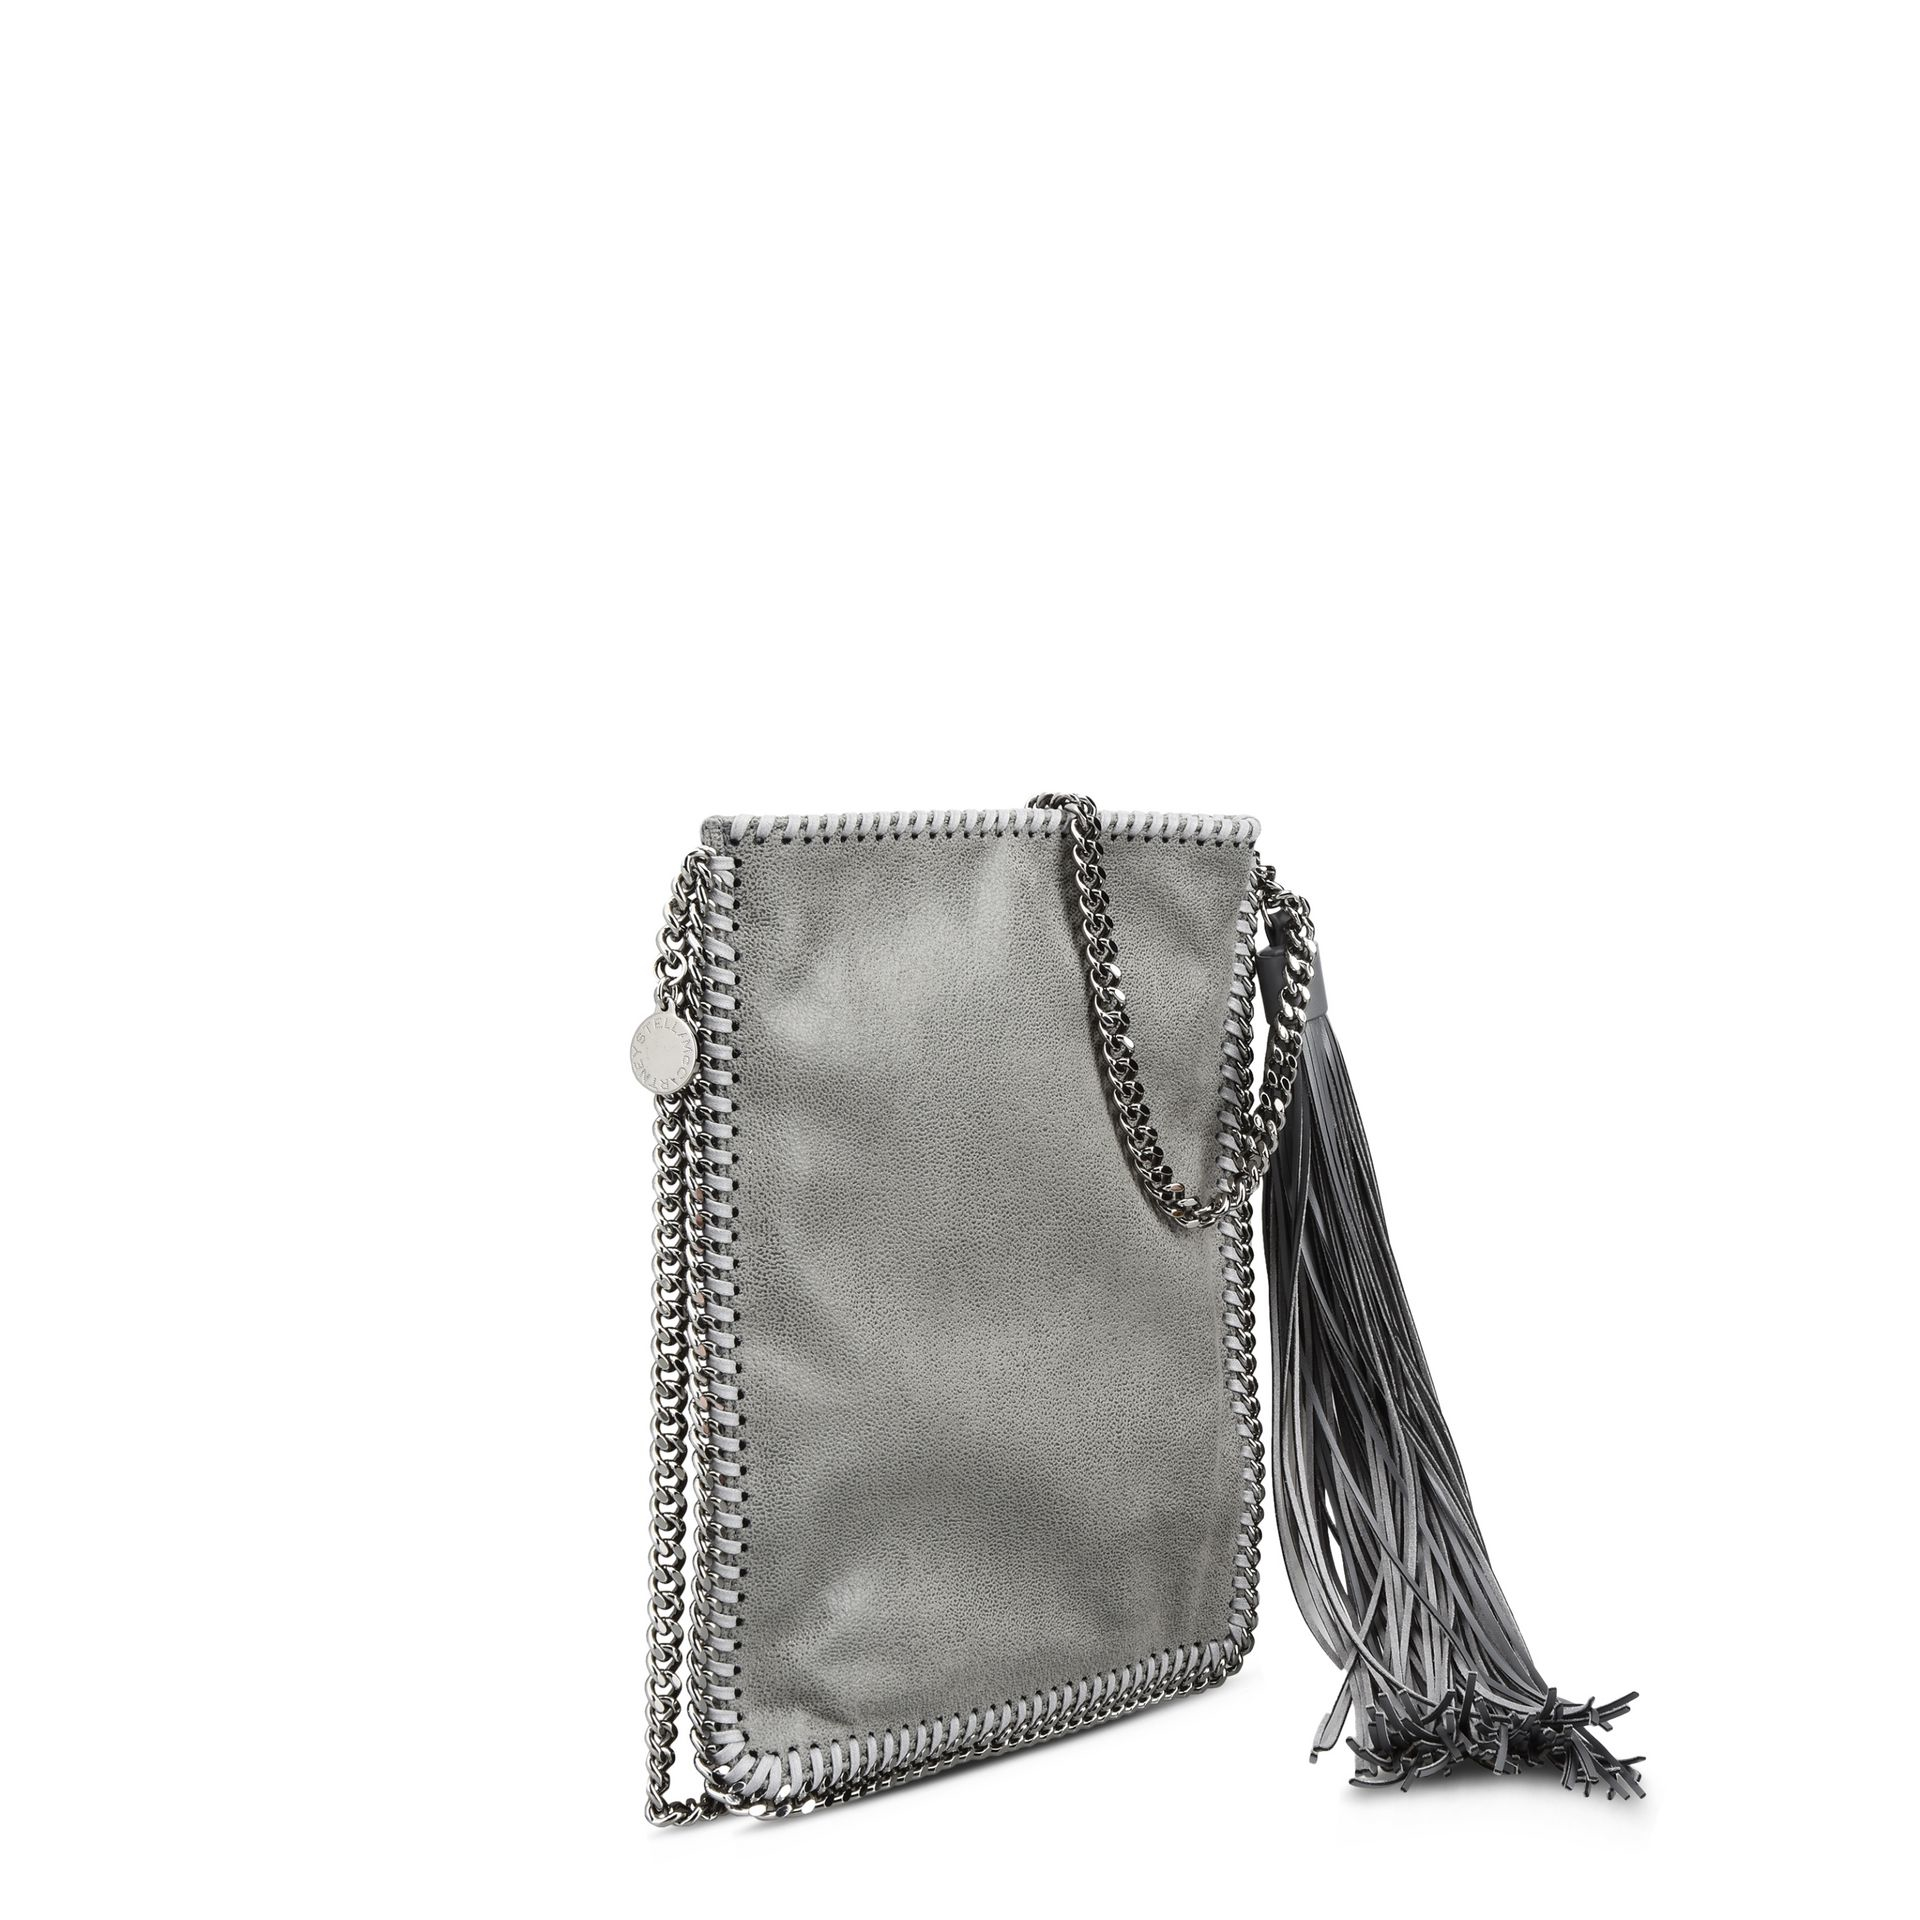 Stella McCartney Synthetic Light Gray Falabella Cross Body Bag